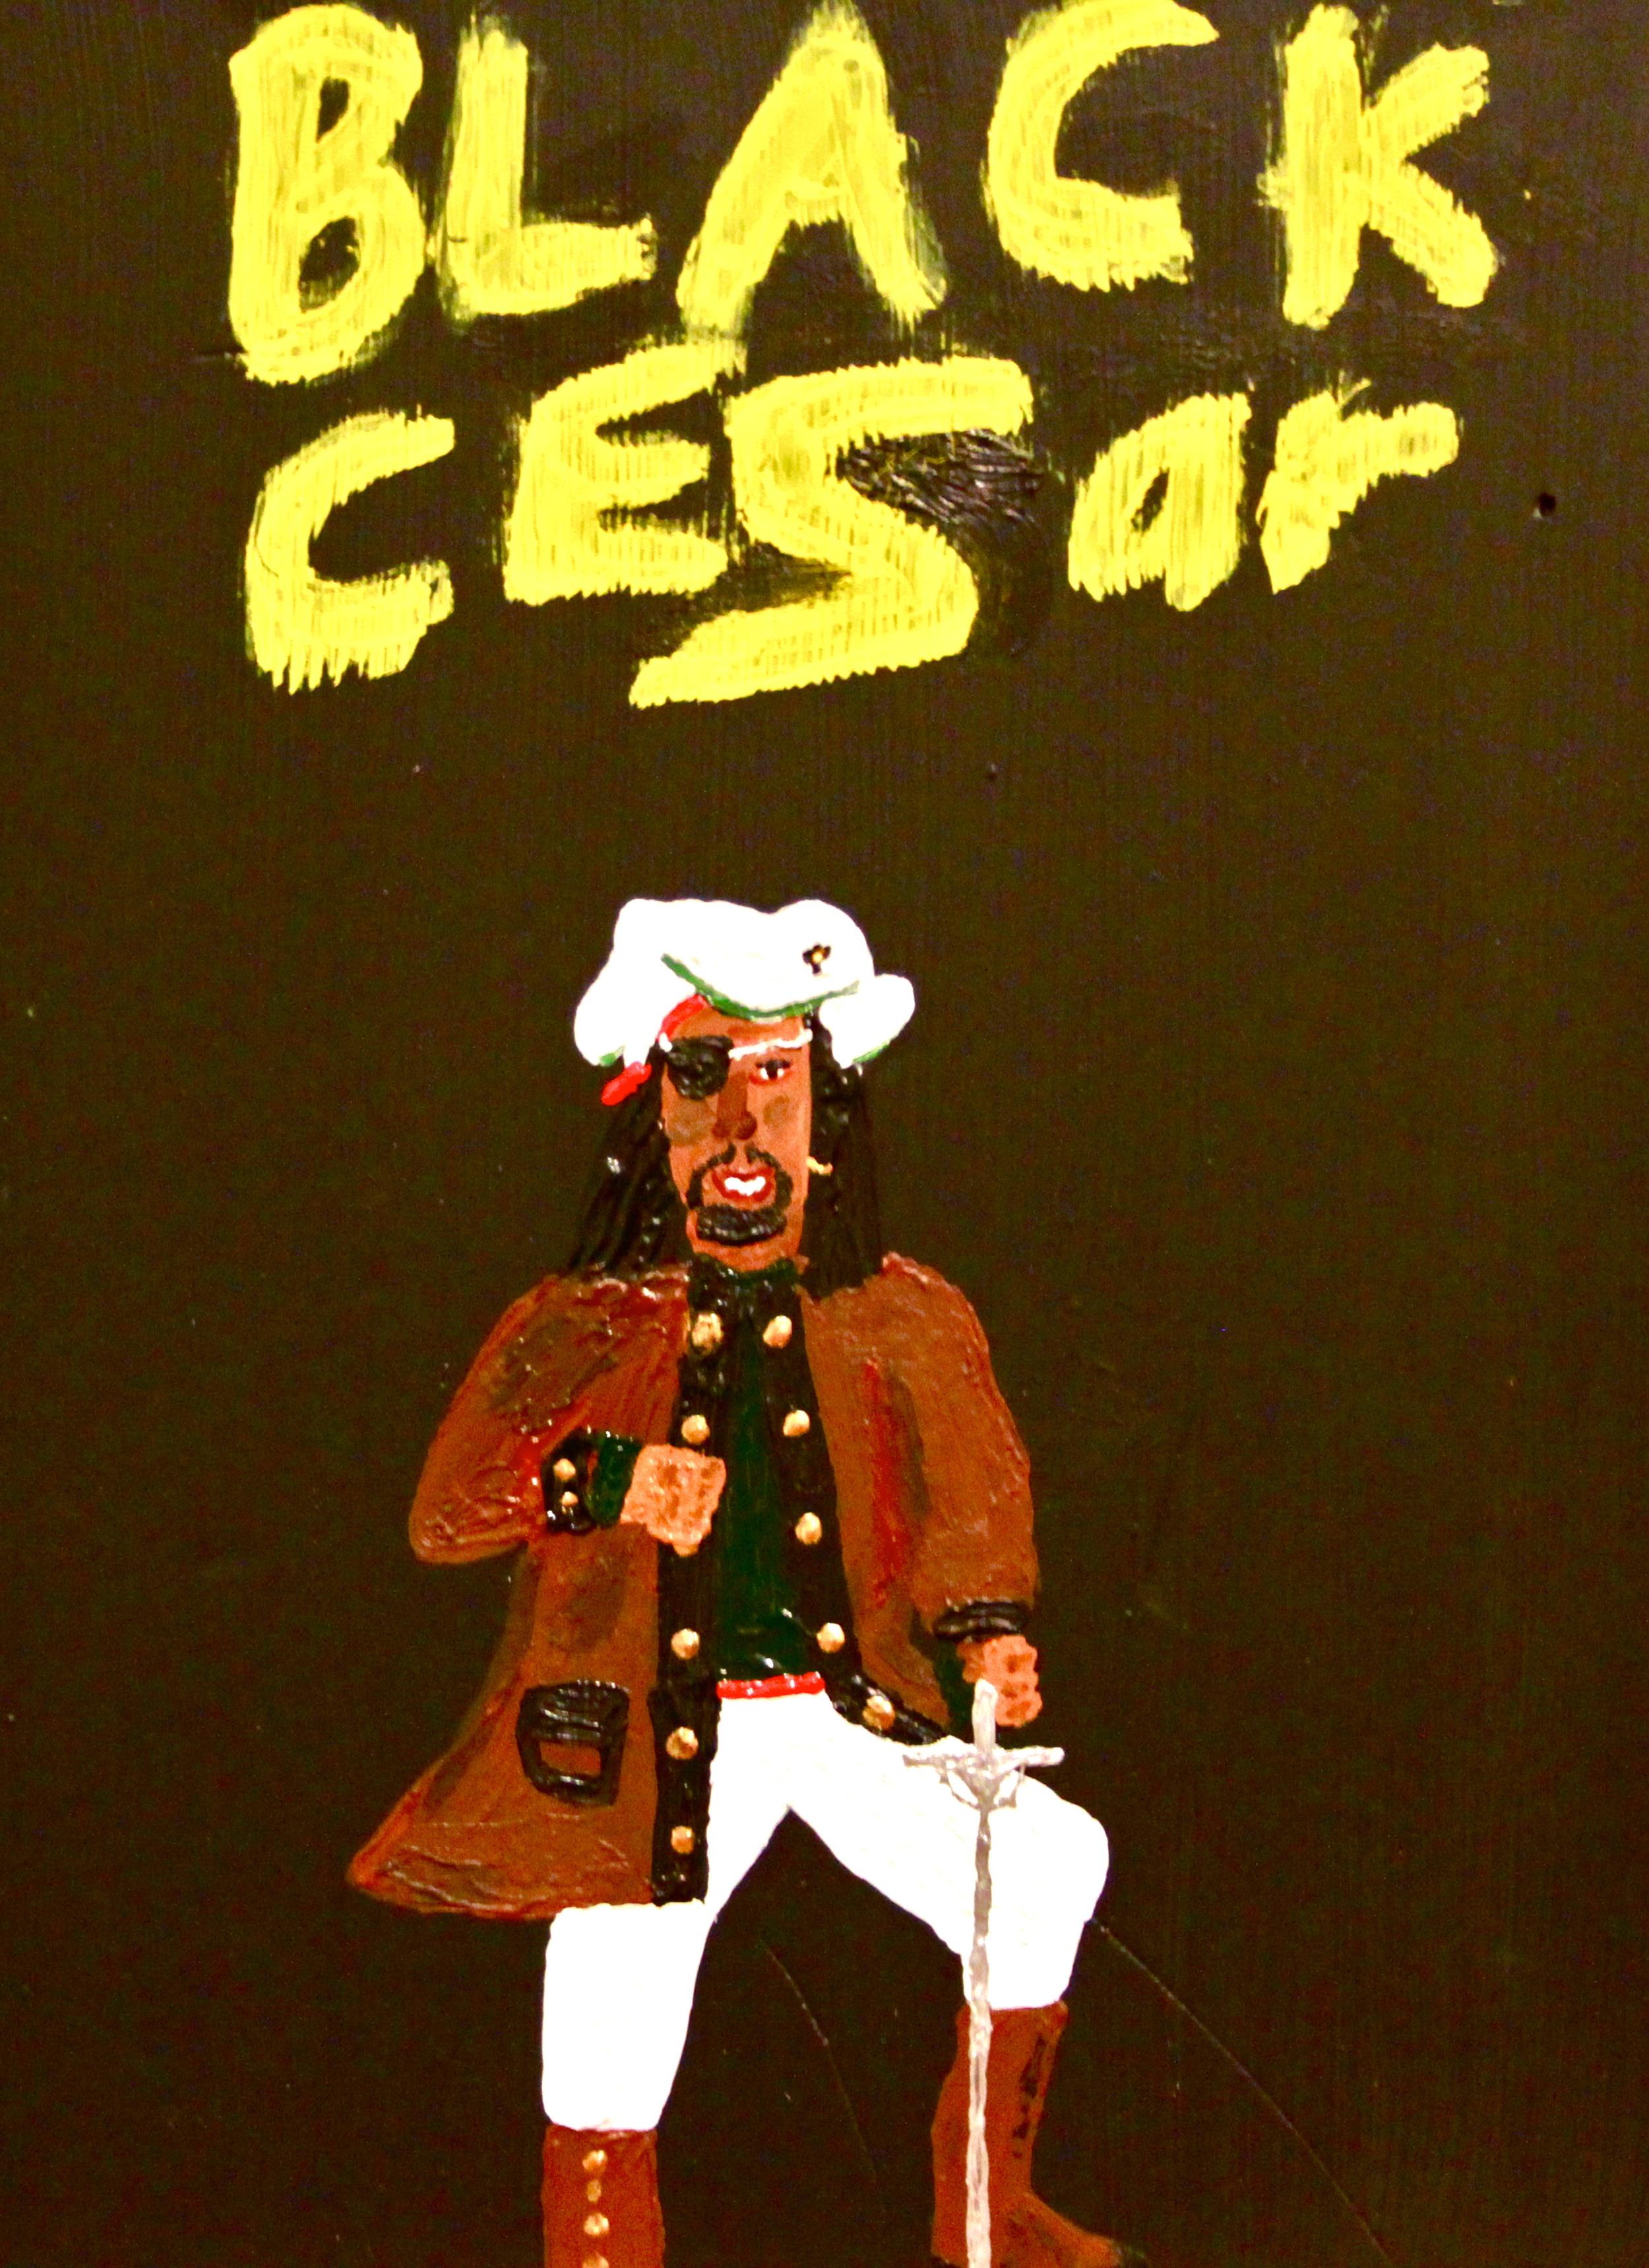 Black Cezar